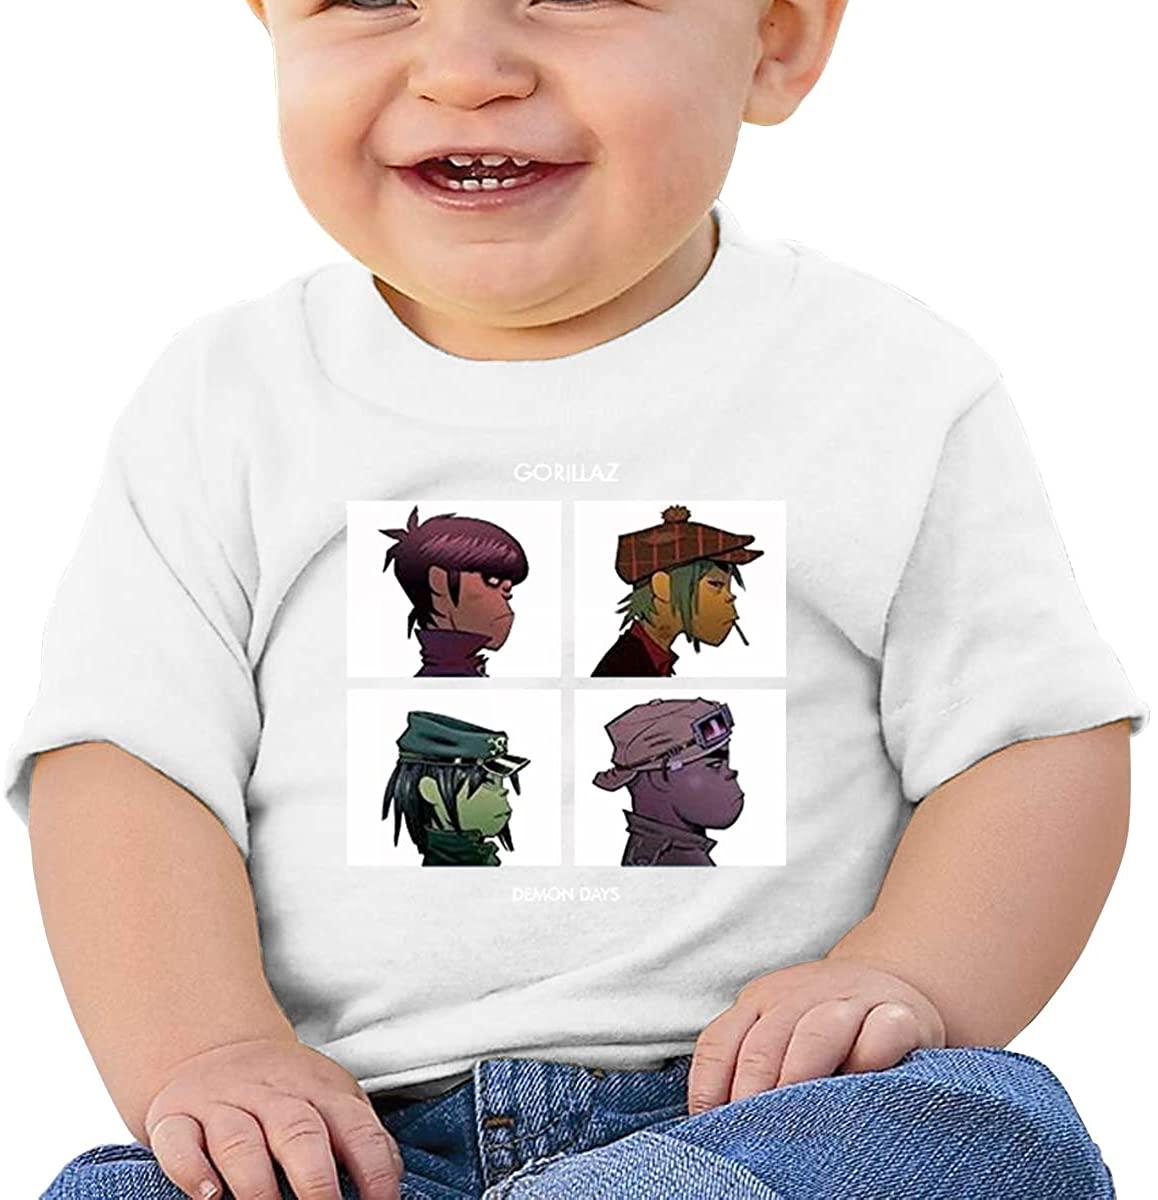 6-24 Months Boy and Girl Baby Short Sleeve T-Shirt Gorillaz Demon Days Original Minimalist Style White